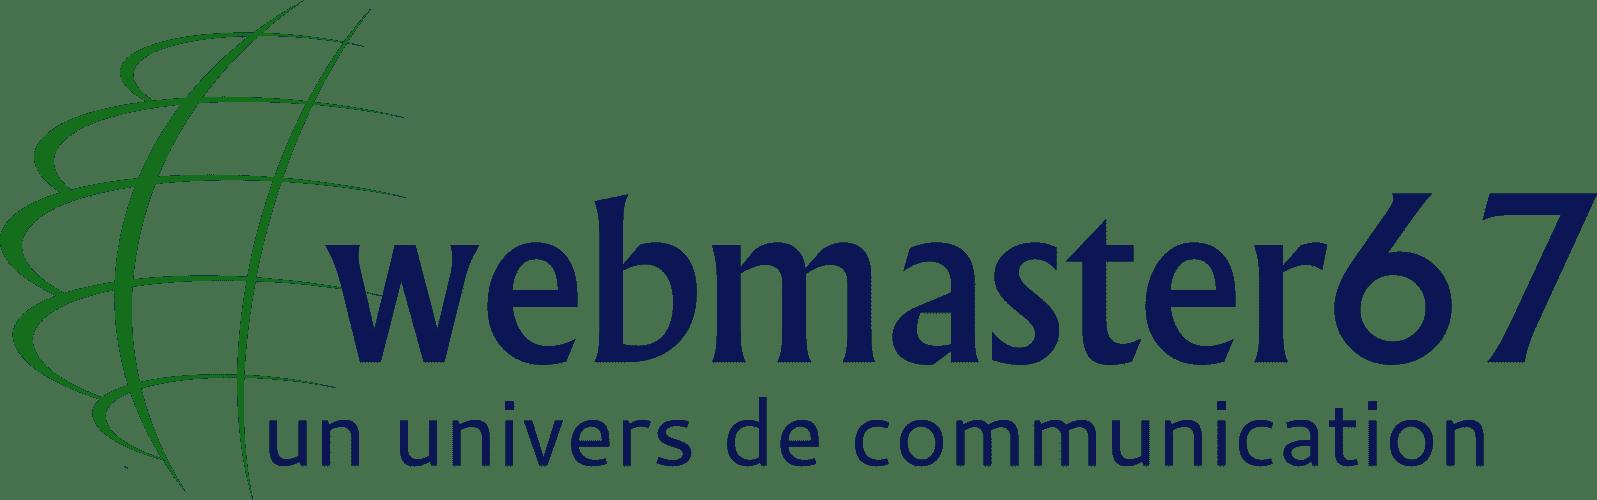 logo webmaster67